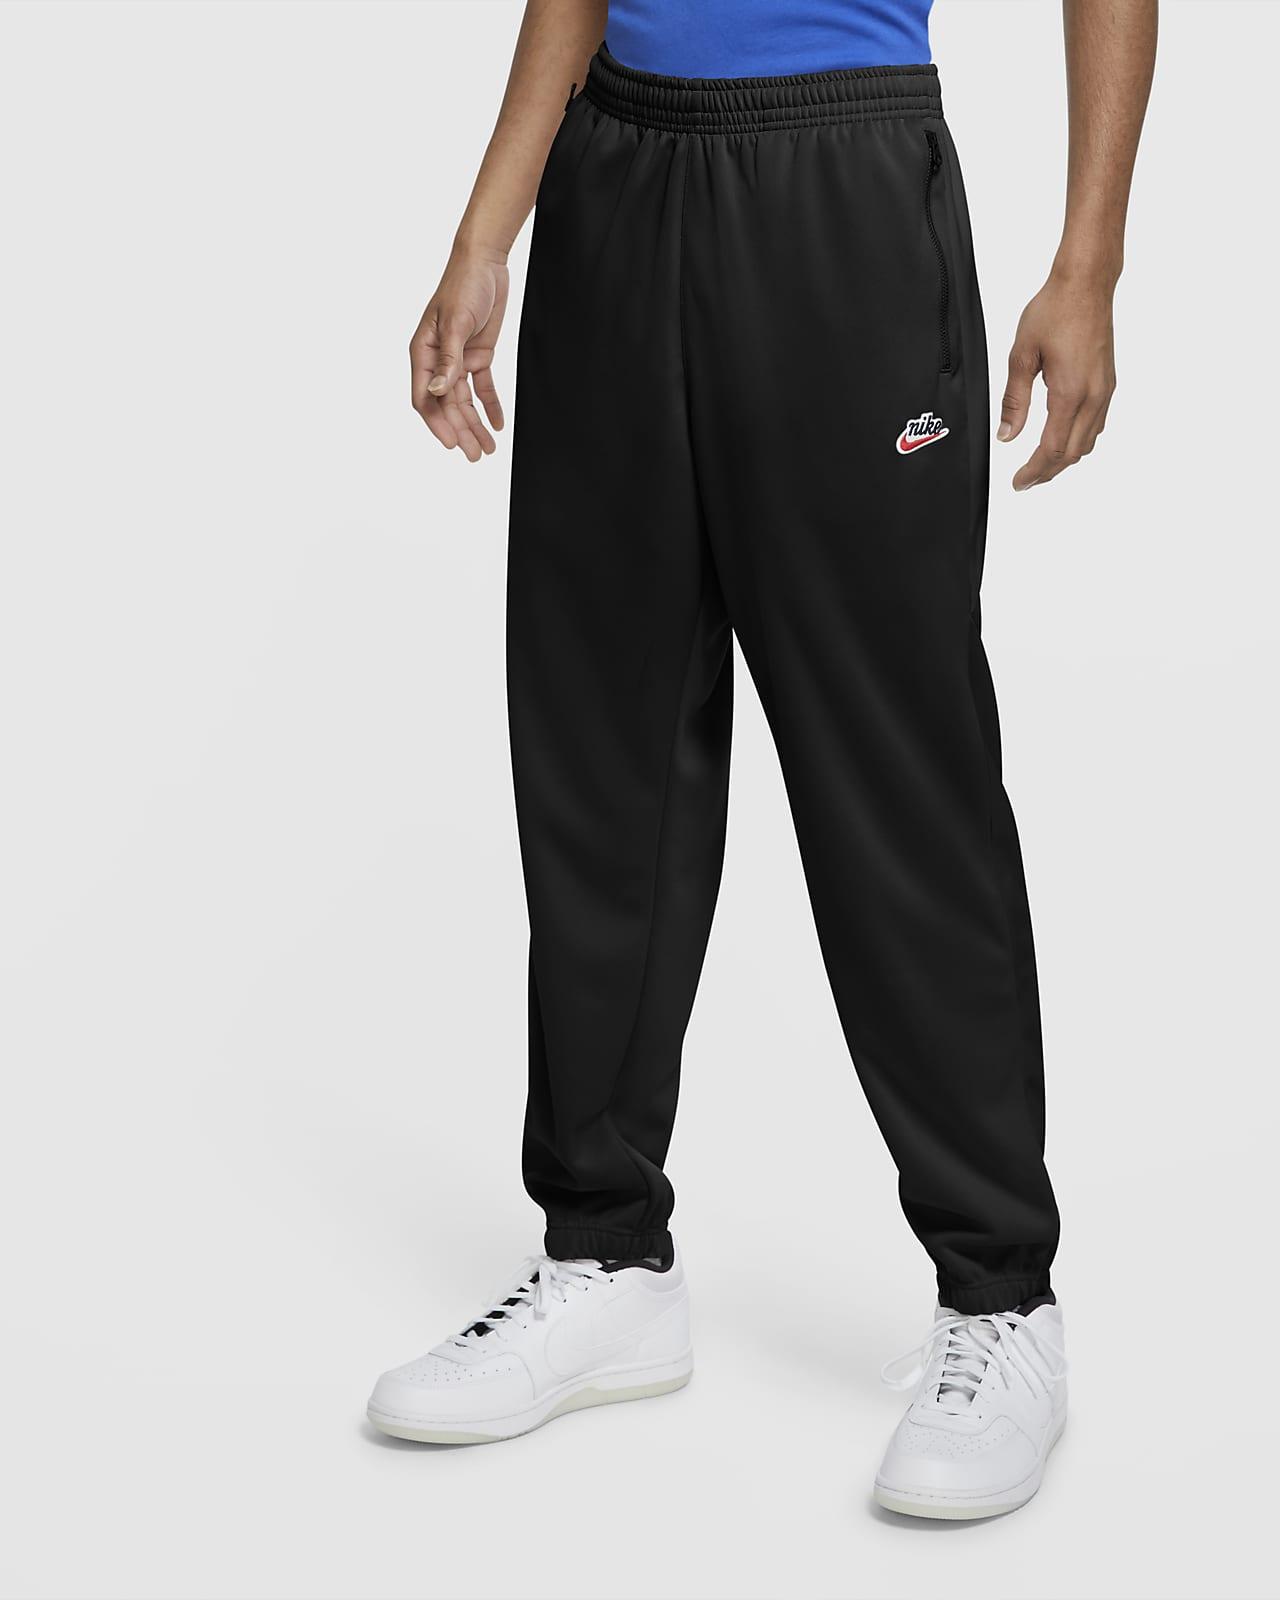 Pantalon Nike Sportswear Heritage pour Homme